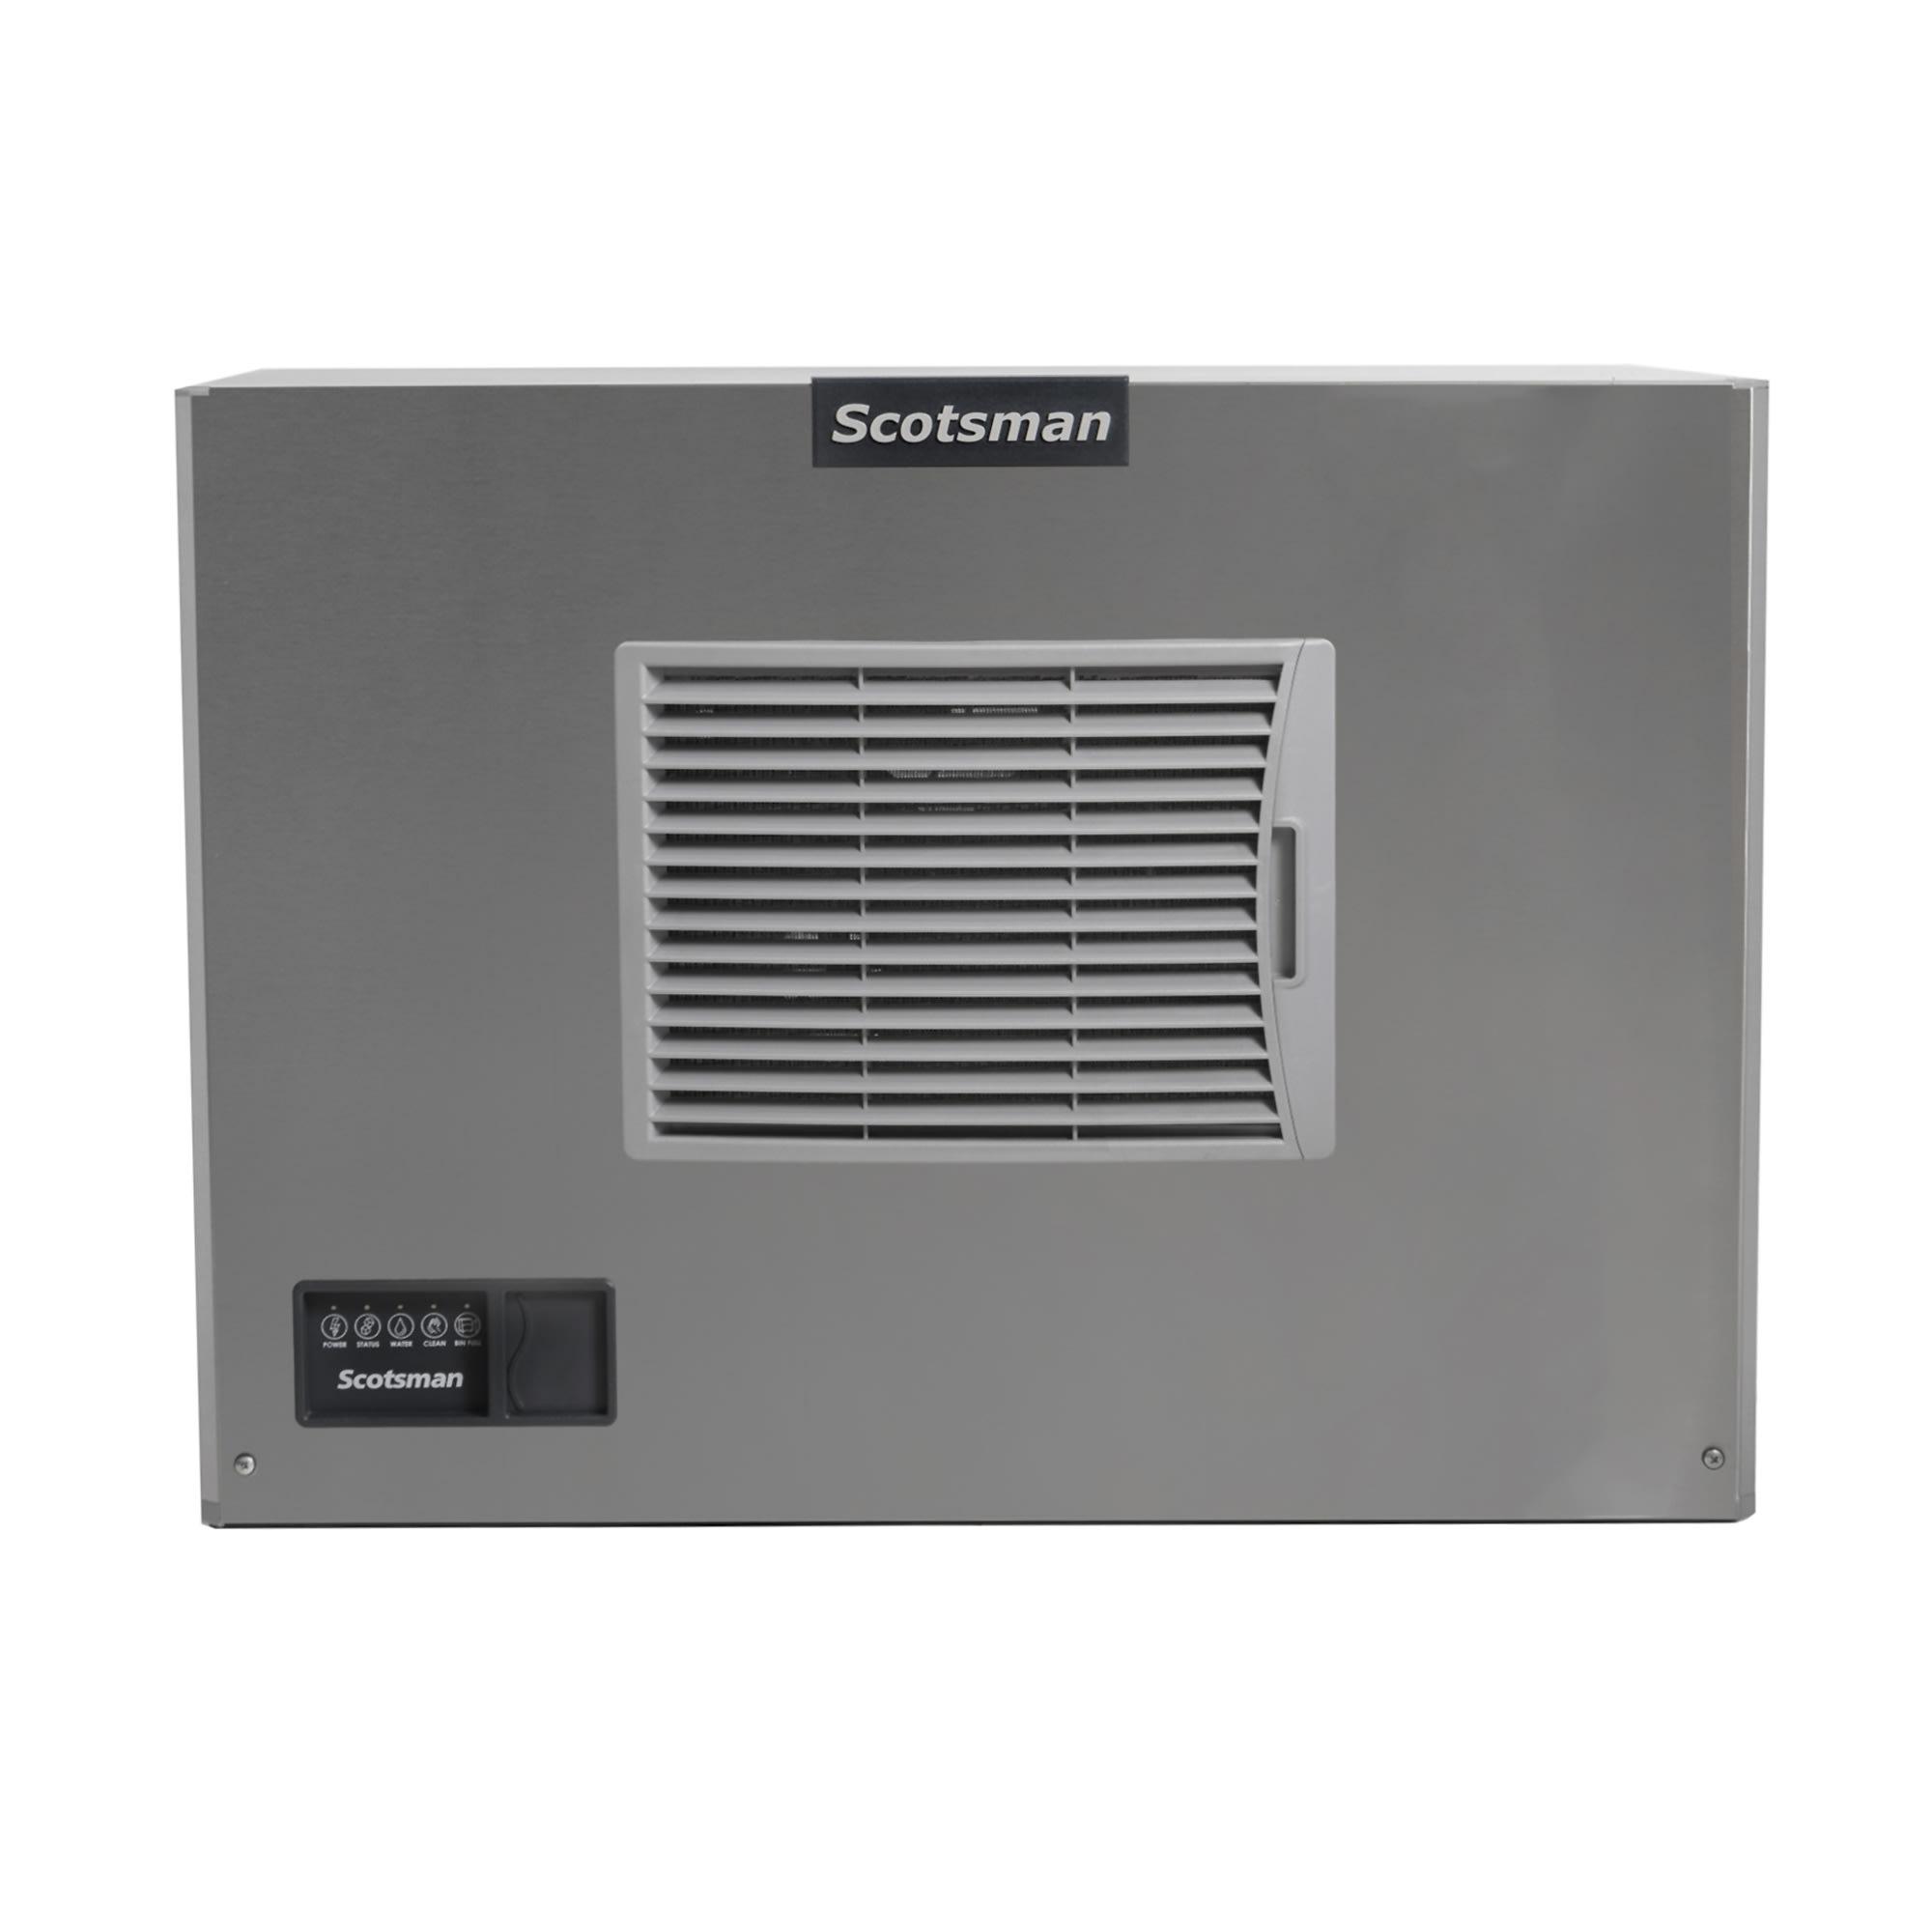 "Scotsman C0530MA-1 30"" Prodigy Plus® Full Cube Ice Machine Head - 525-lb/day, Air Cooled, 115v"